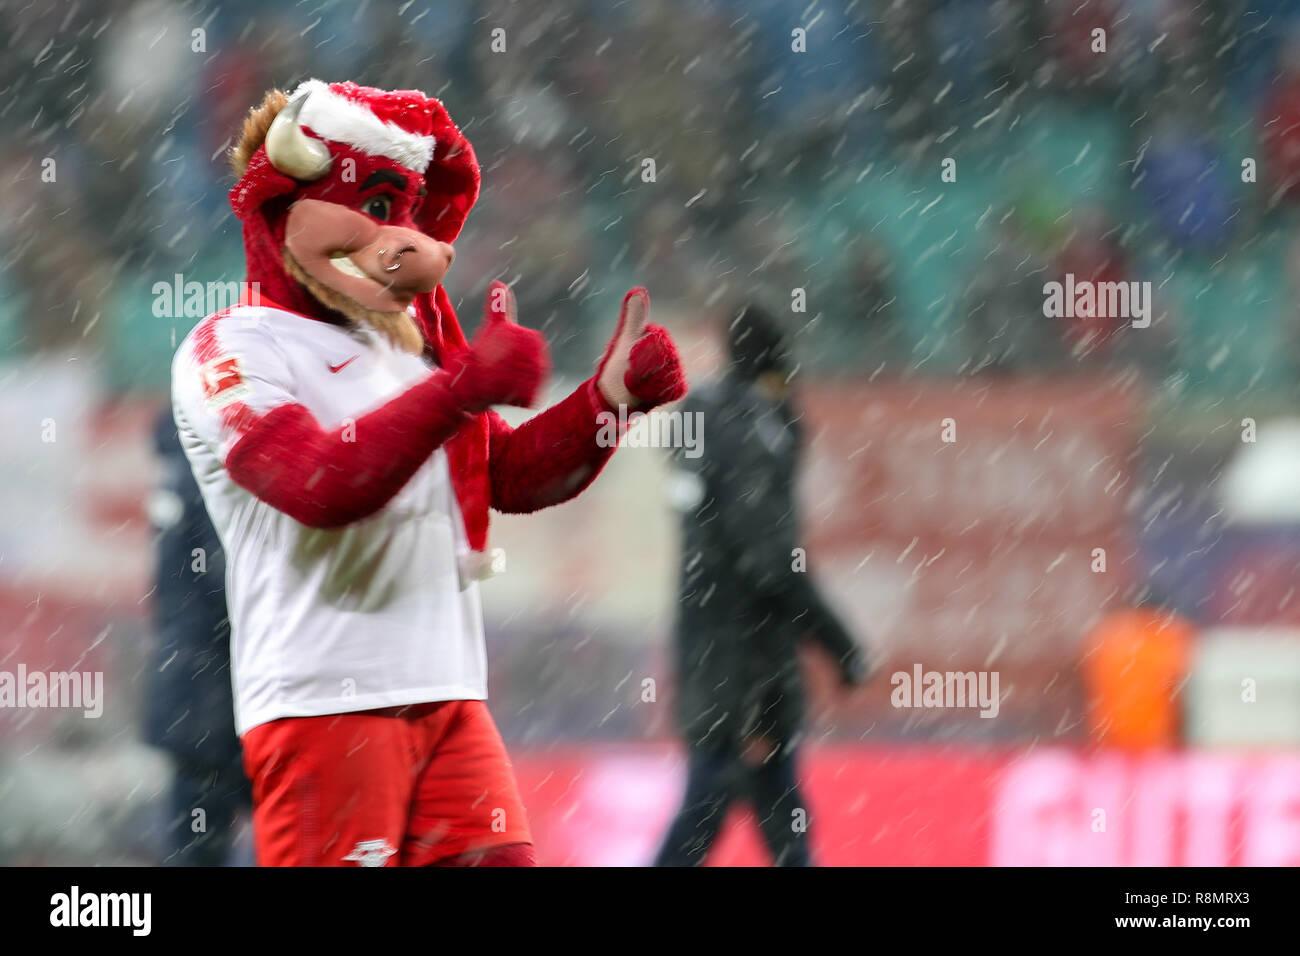 Leipzig Germany 16th Dec 2018 Soccer Bundesliga 15th Matchday Rb Leipzig Fsv Mainz 05 In The